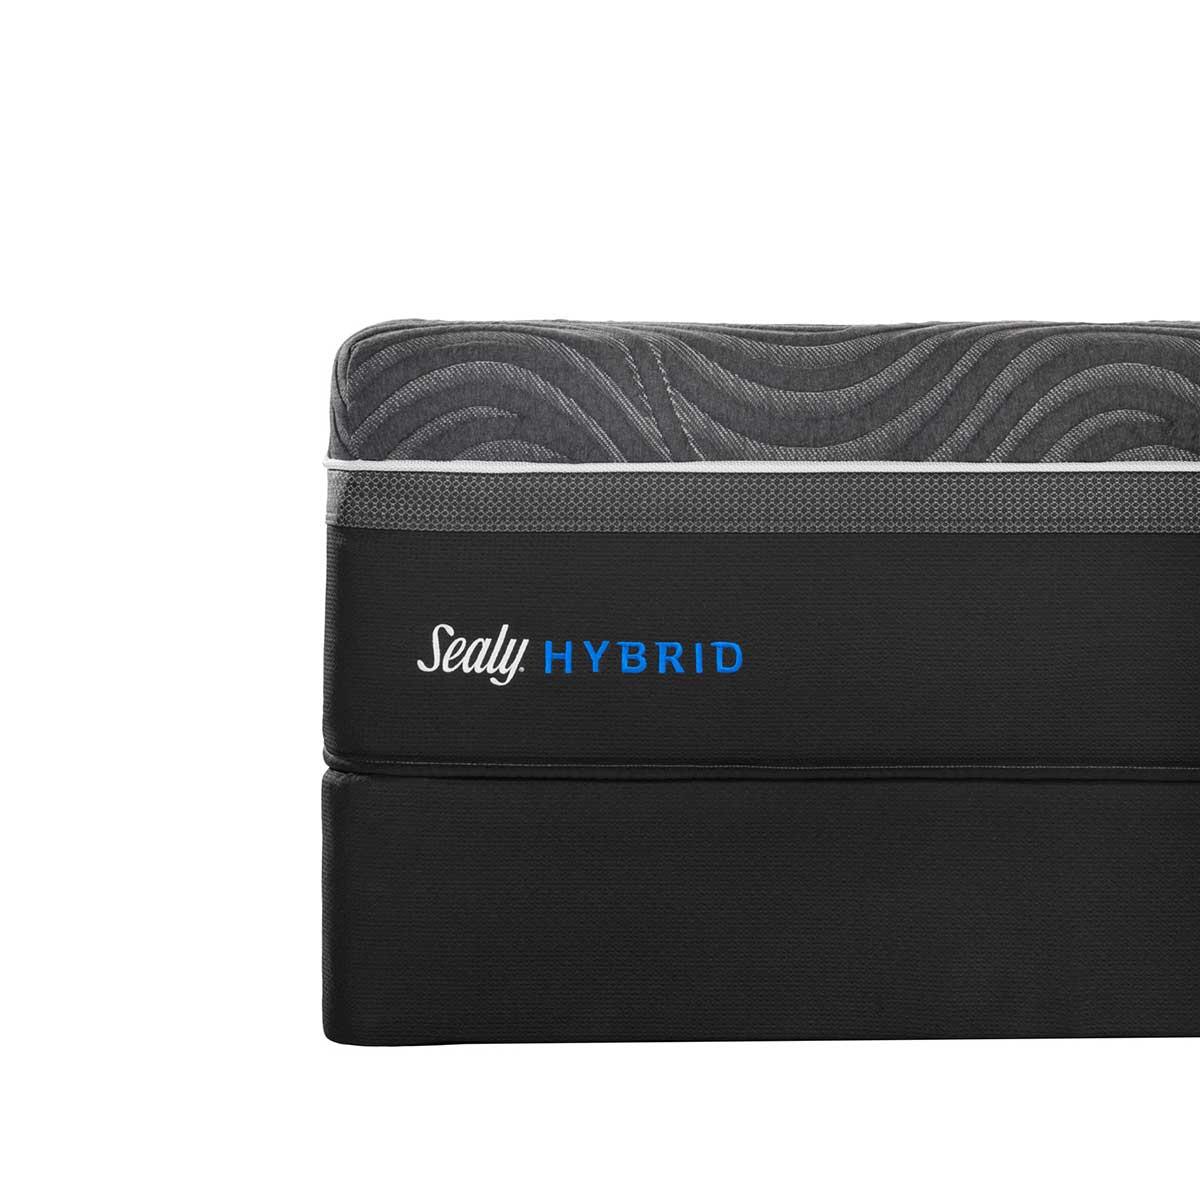 Sealy Hybrid Silver Chill Ps Hybrid Mattress Las Vegas